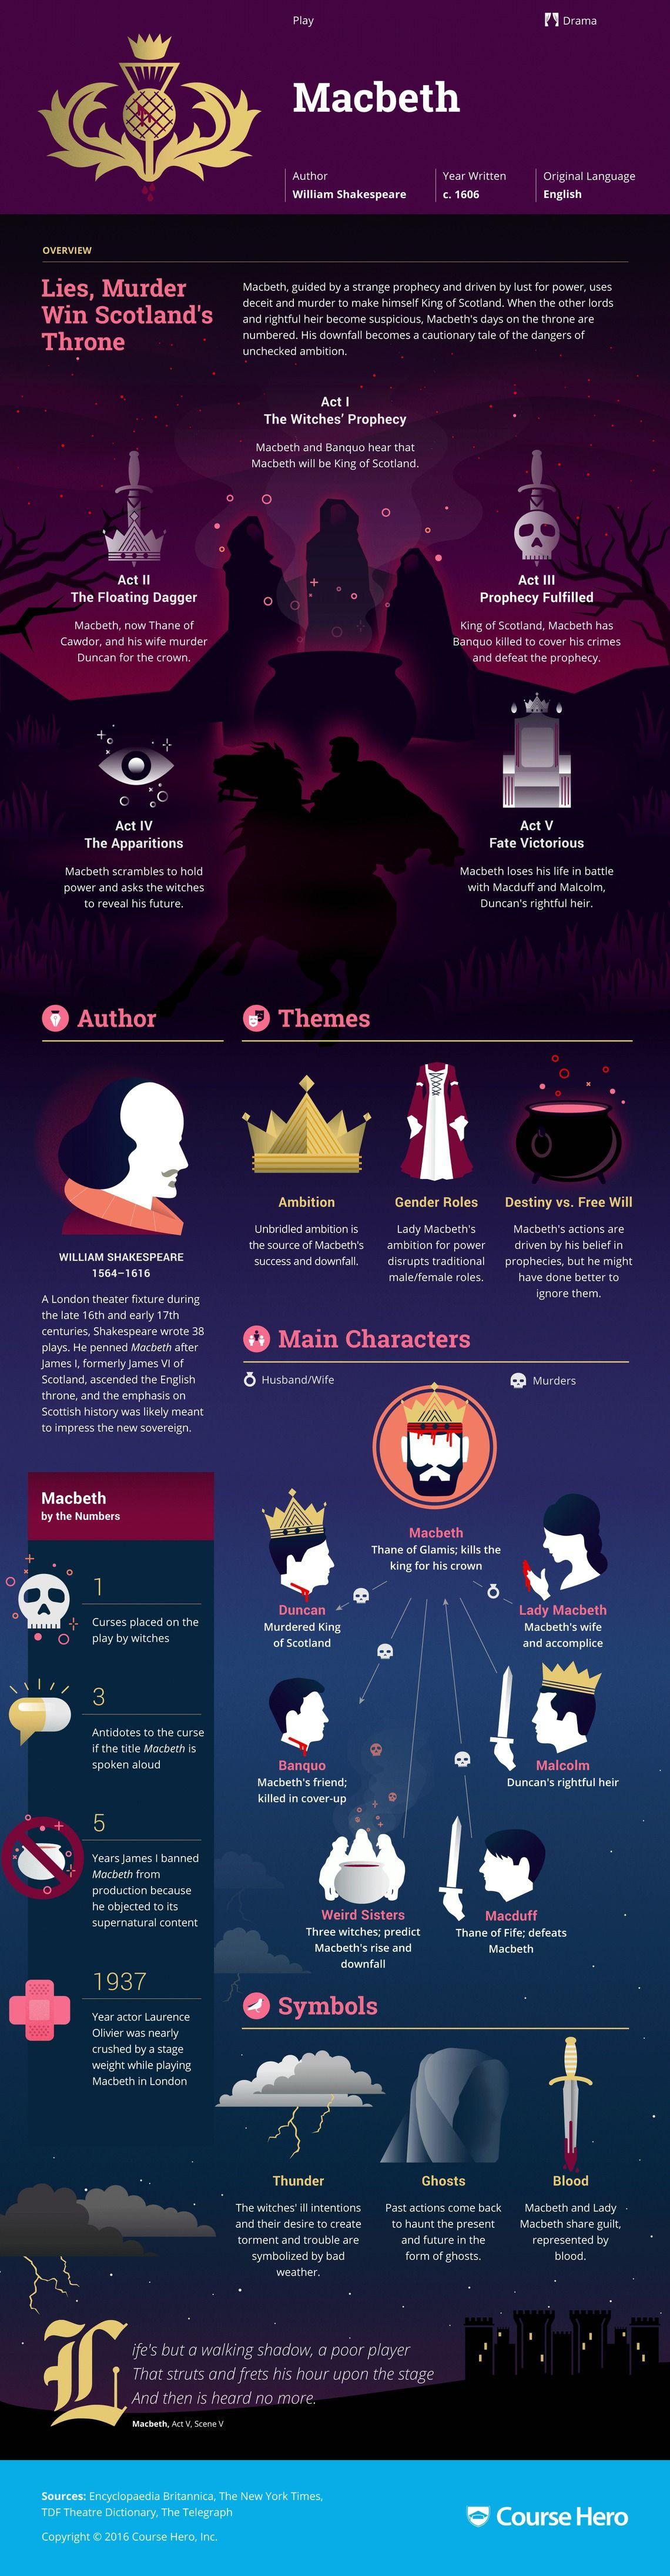 Macbeth Study Guide  Teaching  Literature Books Shakespeare Macbeth Infographic  Course Hero